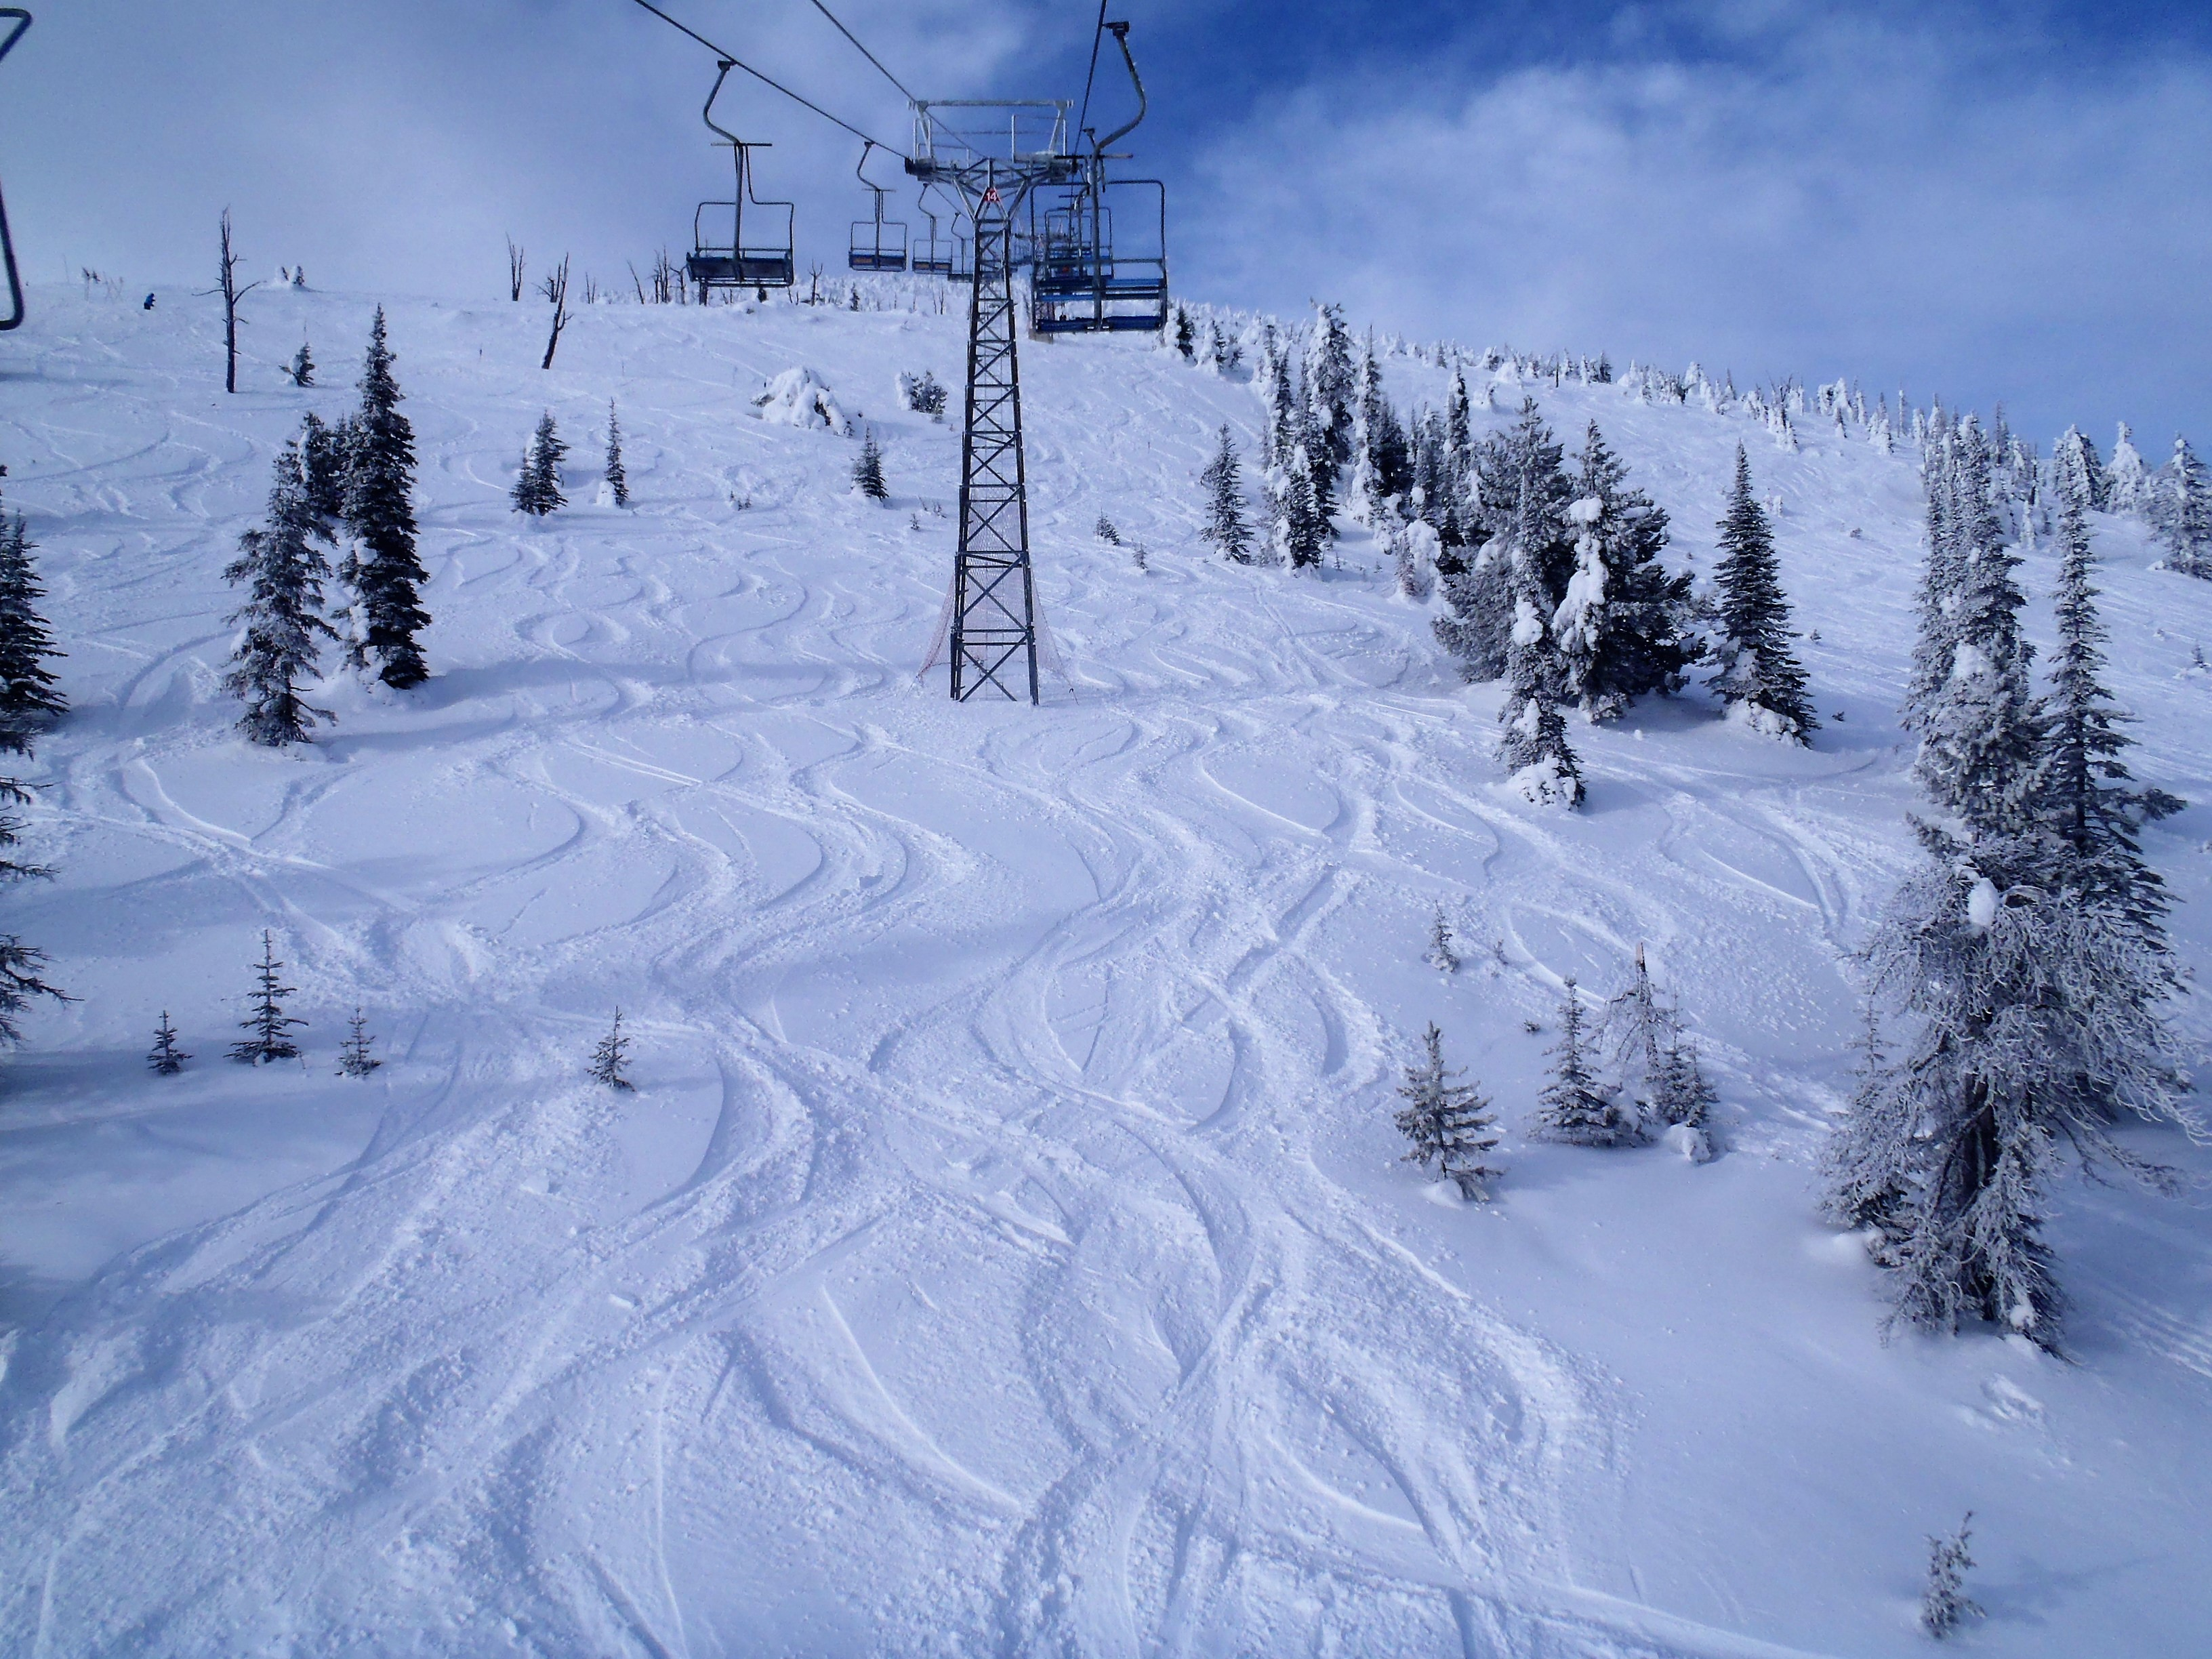 Nice dusting of snow, Baldy Mountain Resort